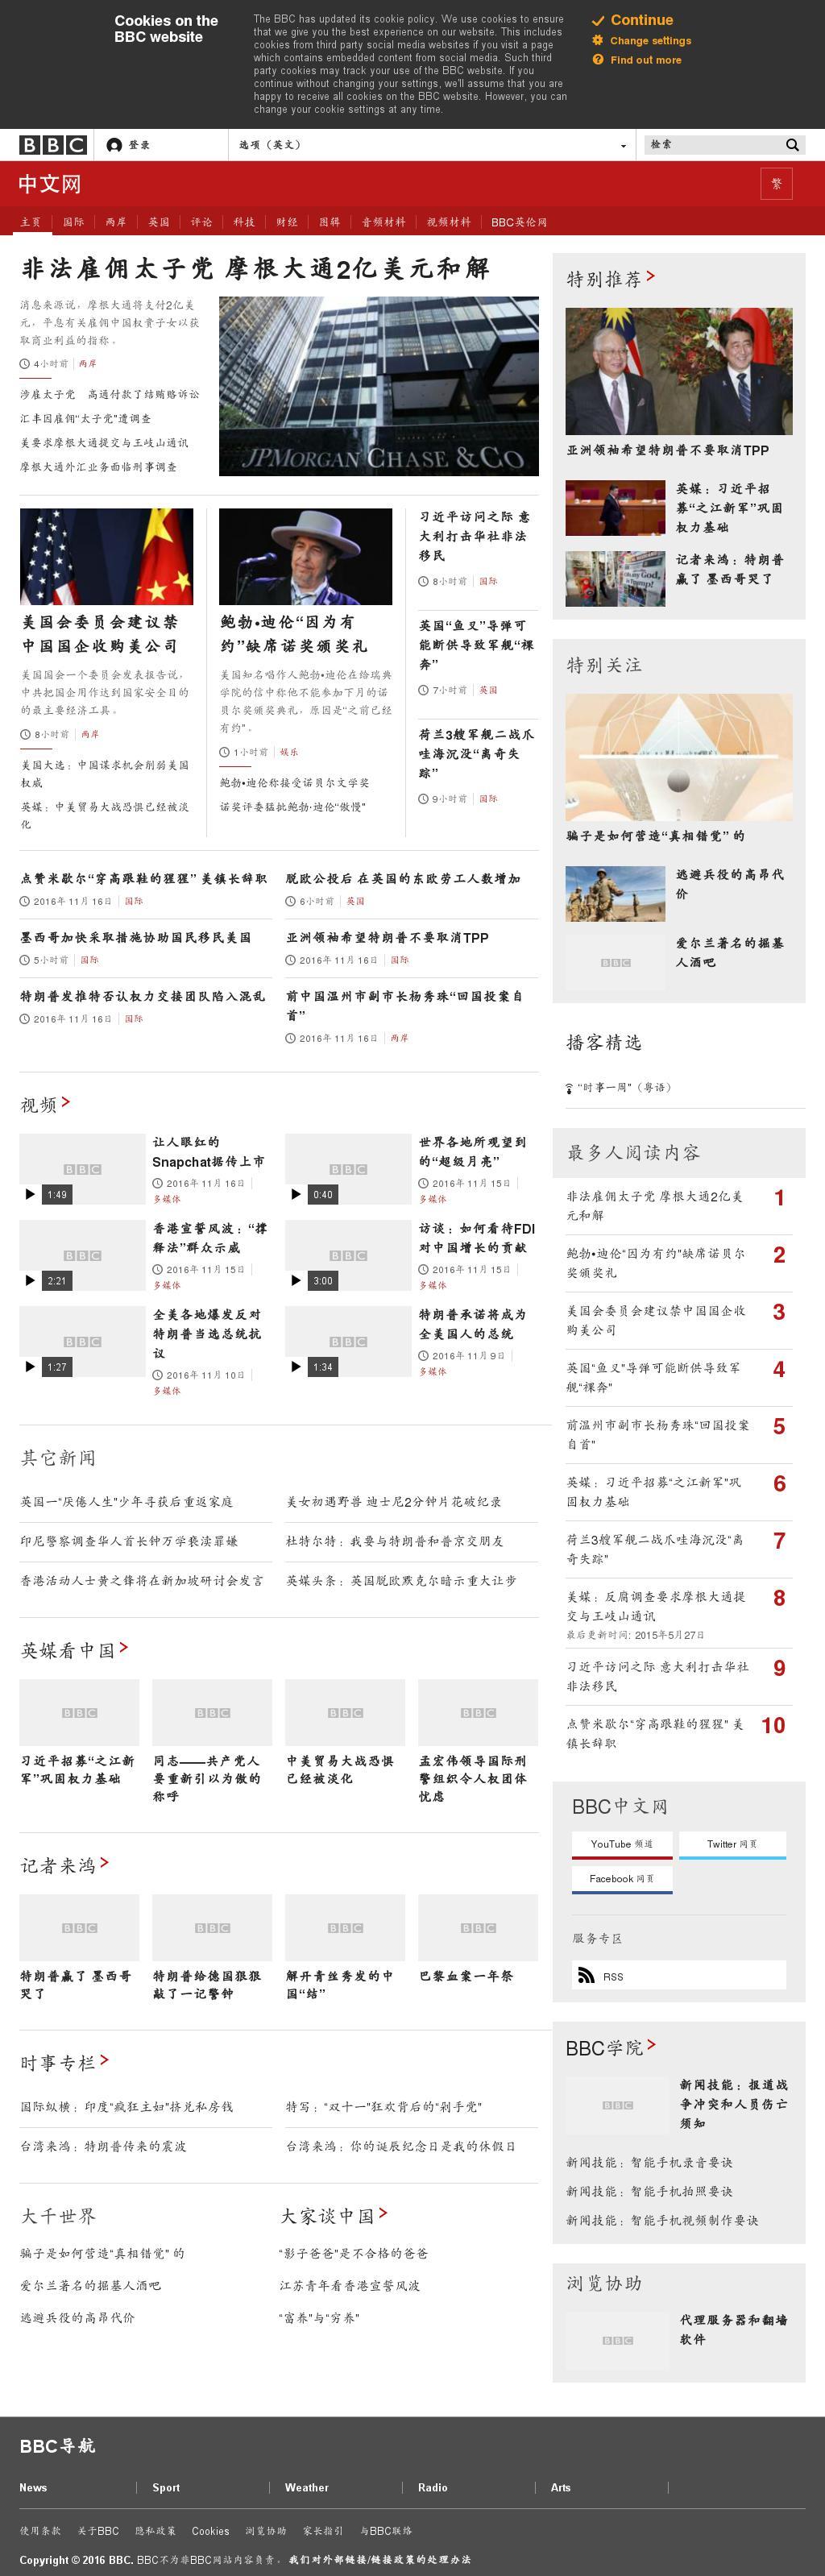 BBC (Chinese) at Thursday Nov. 17, 2016, 4 a.m. UTC